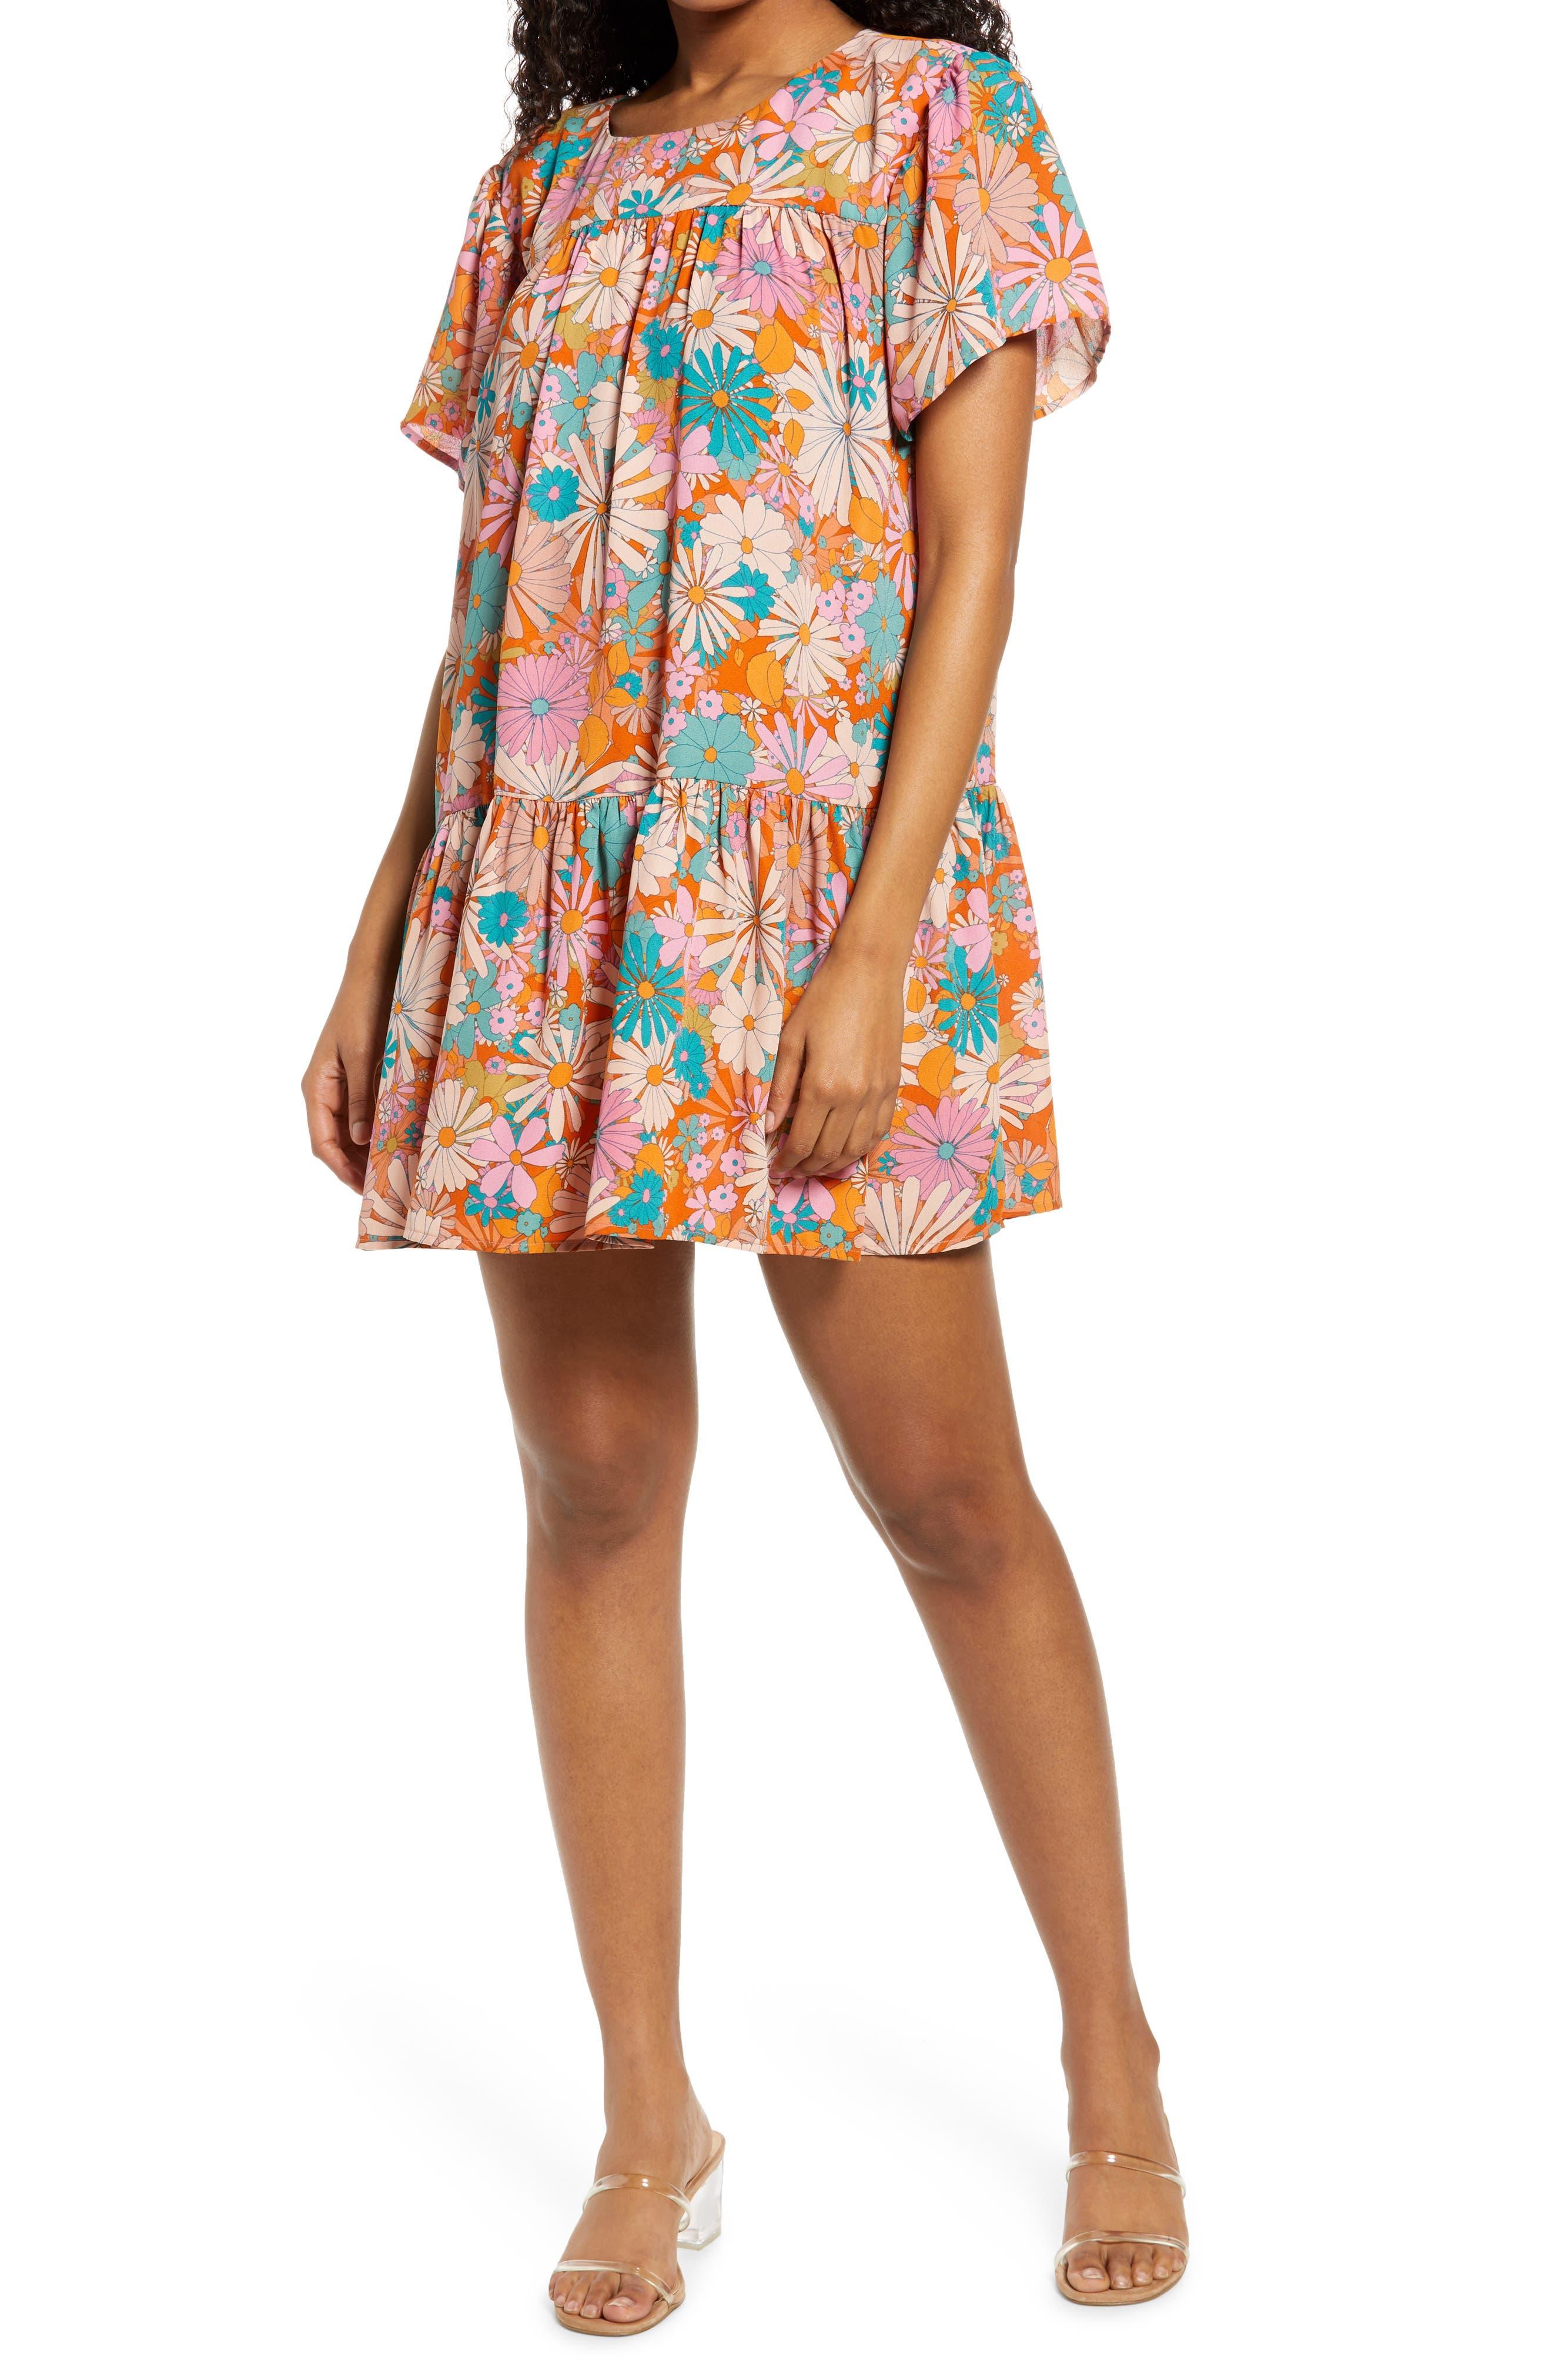 In Retrospect Floral Shift Dress